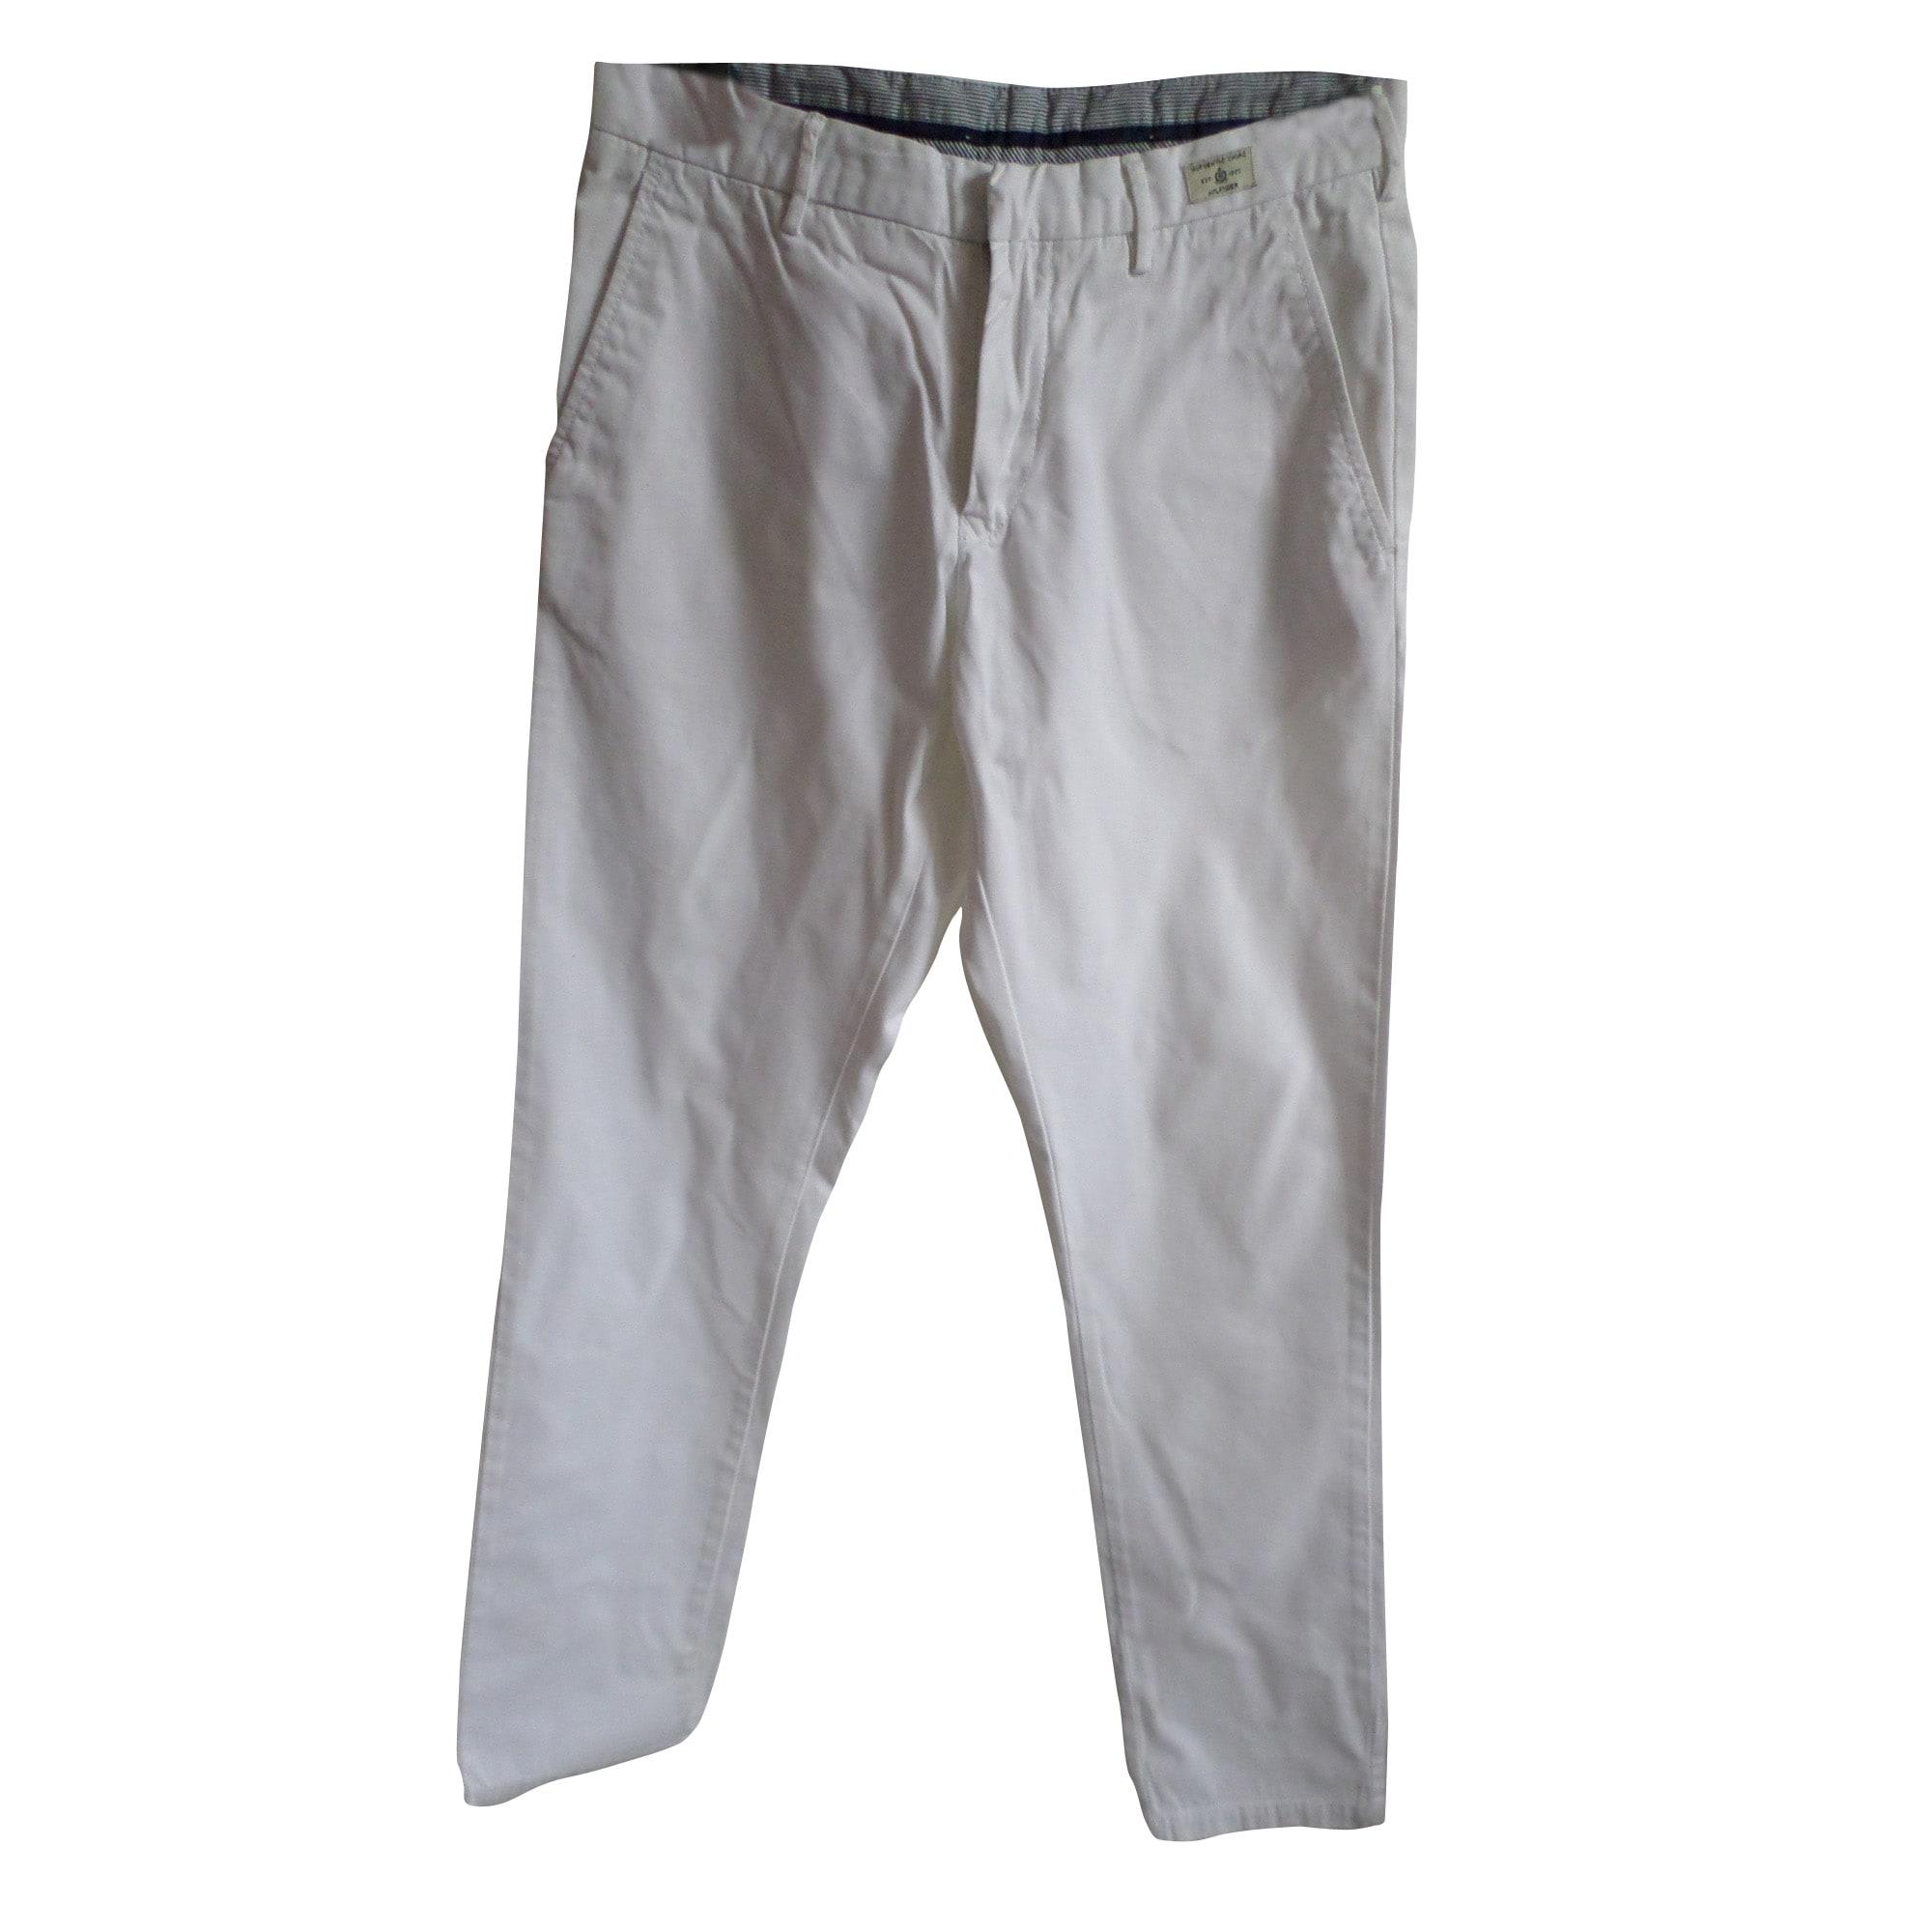 Pantalon droit TOMMY HILFIGER Blanc, blanc cassé, écru